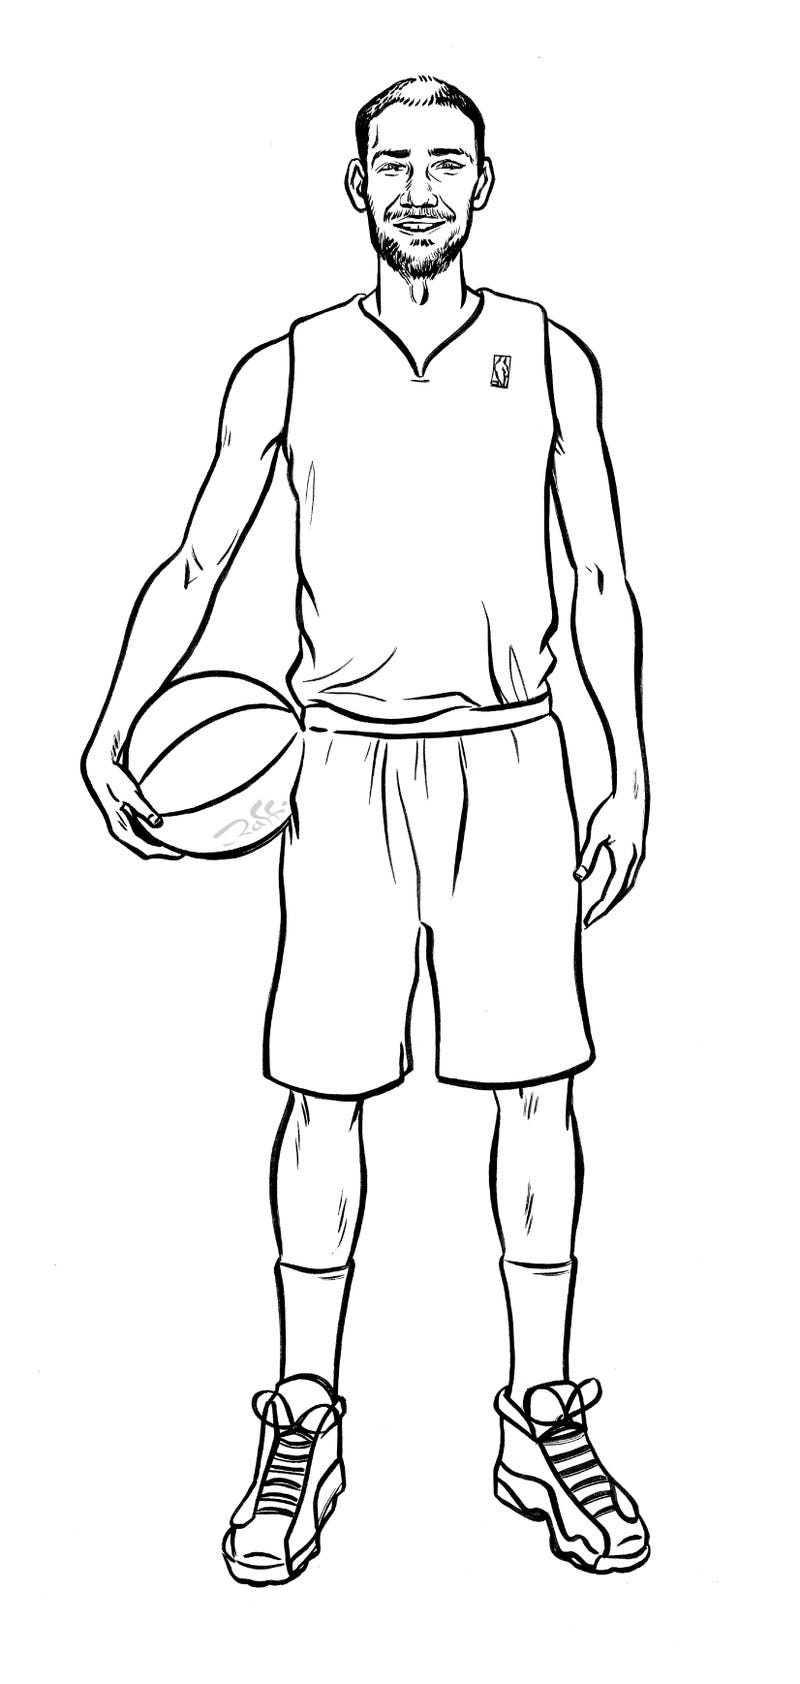 MS Paint Contest: Design A Better Toronto NBA Team